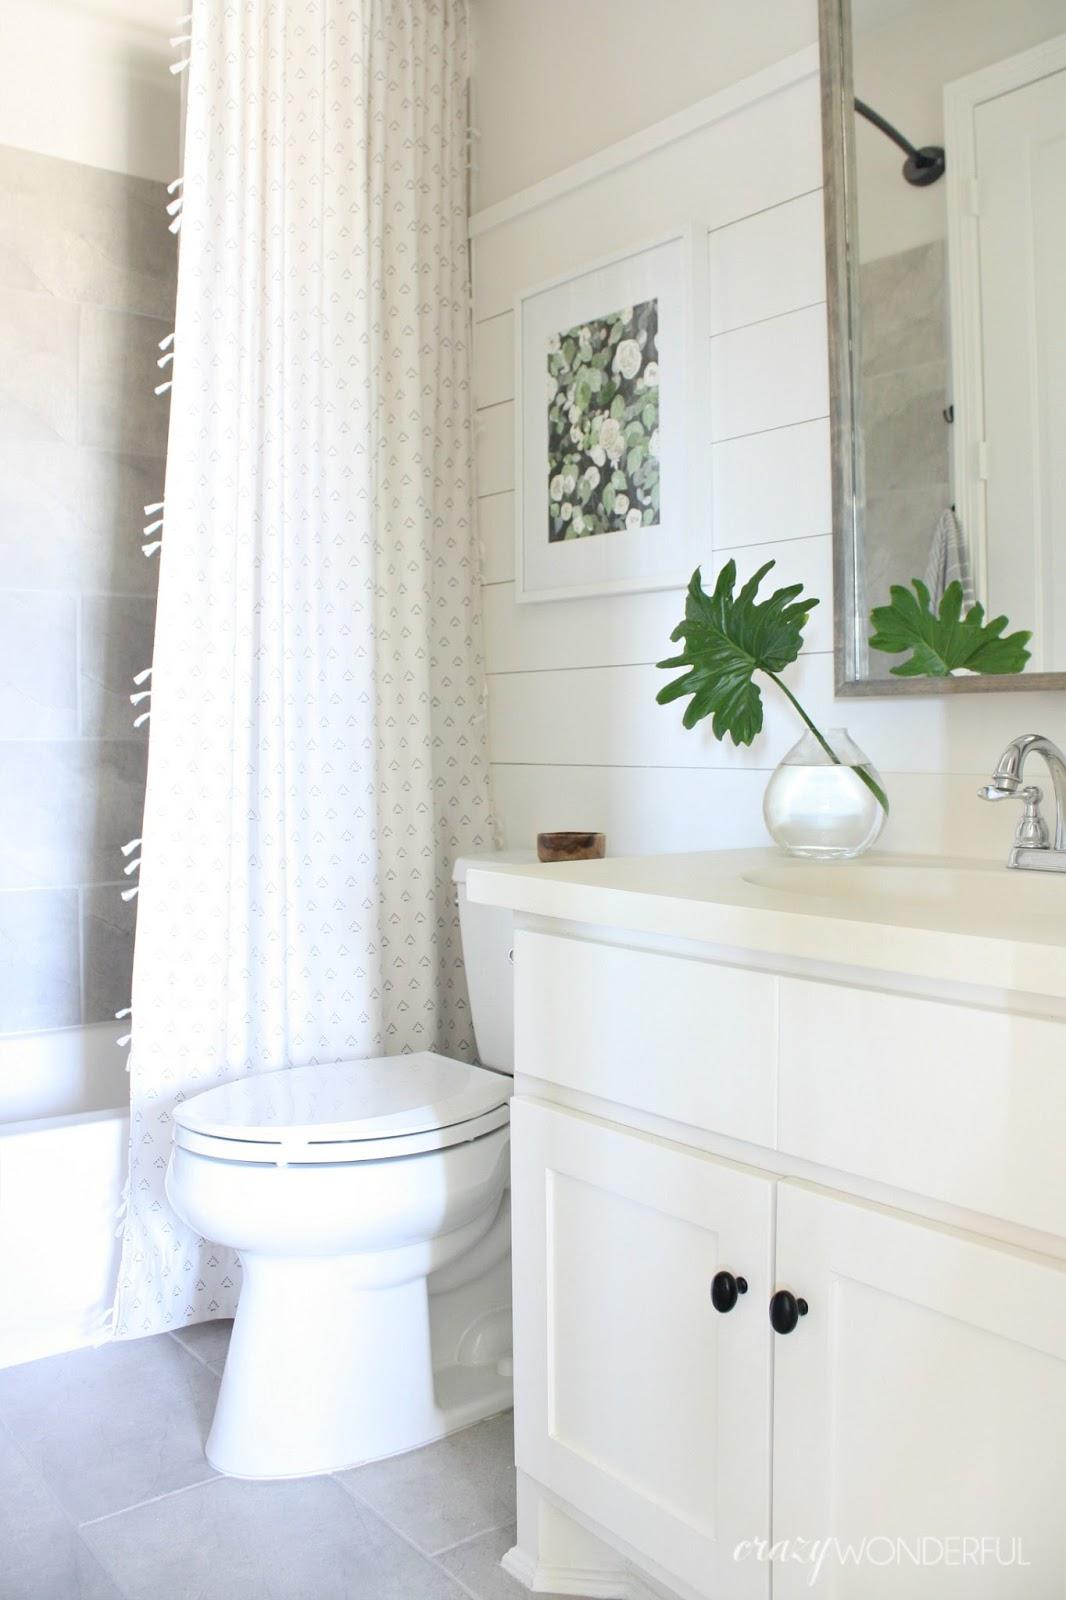 Meddium Size Bathroom Design Ideas Pictures ~ Builder grade bathroom makeover crazy wonderful